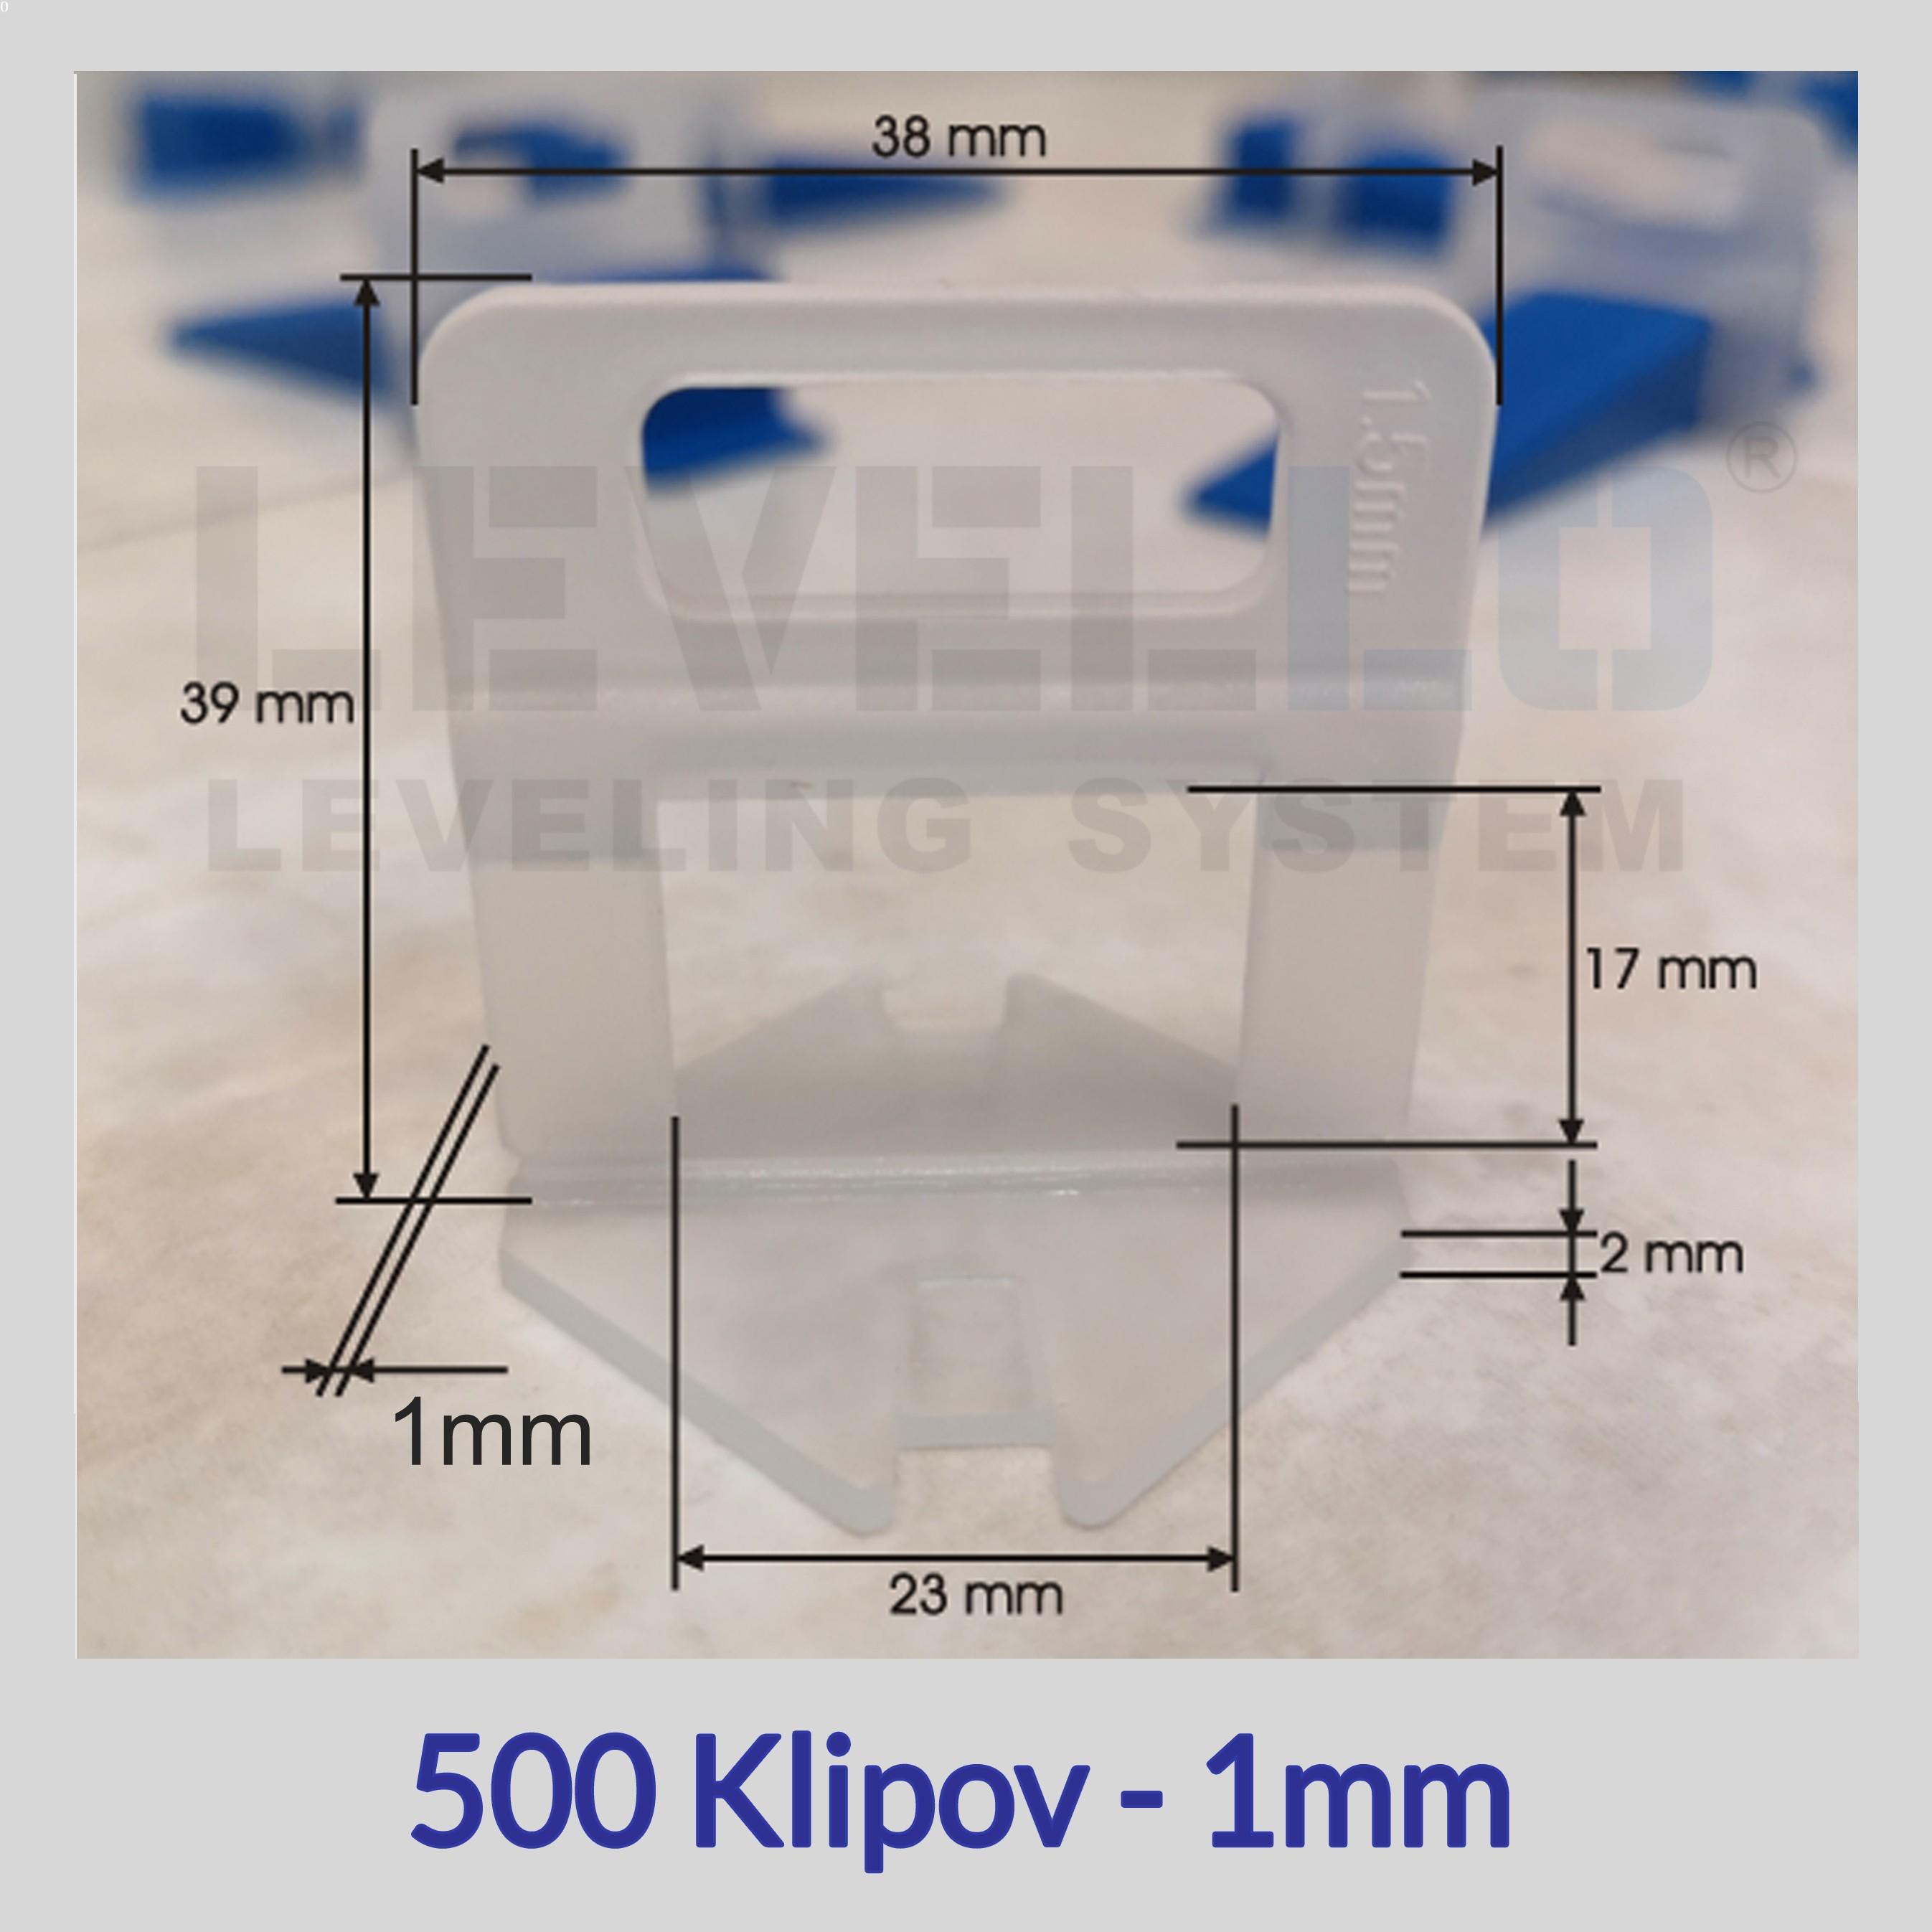 Klipy Eko LEVELLO ® 1 mm, 500 kusov